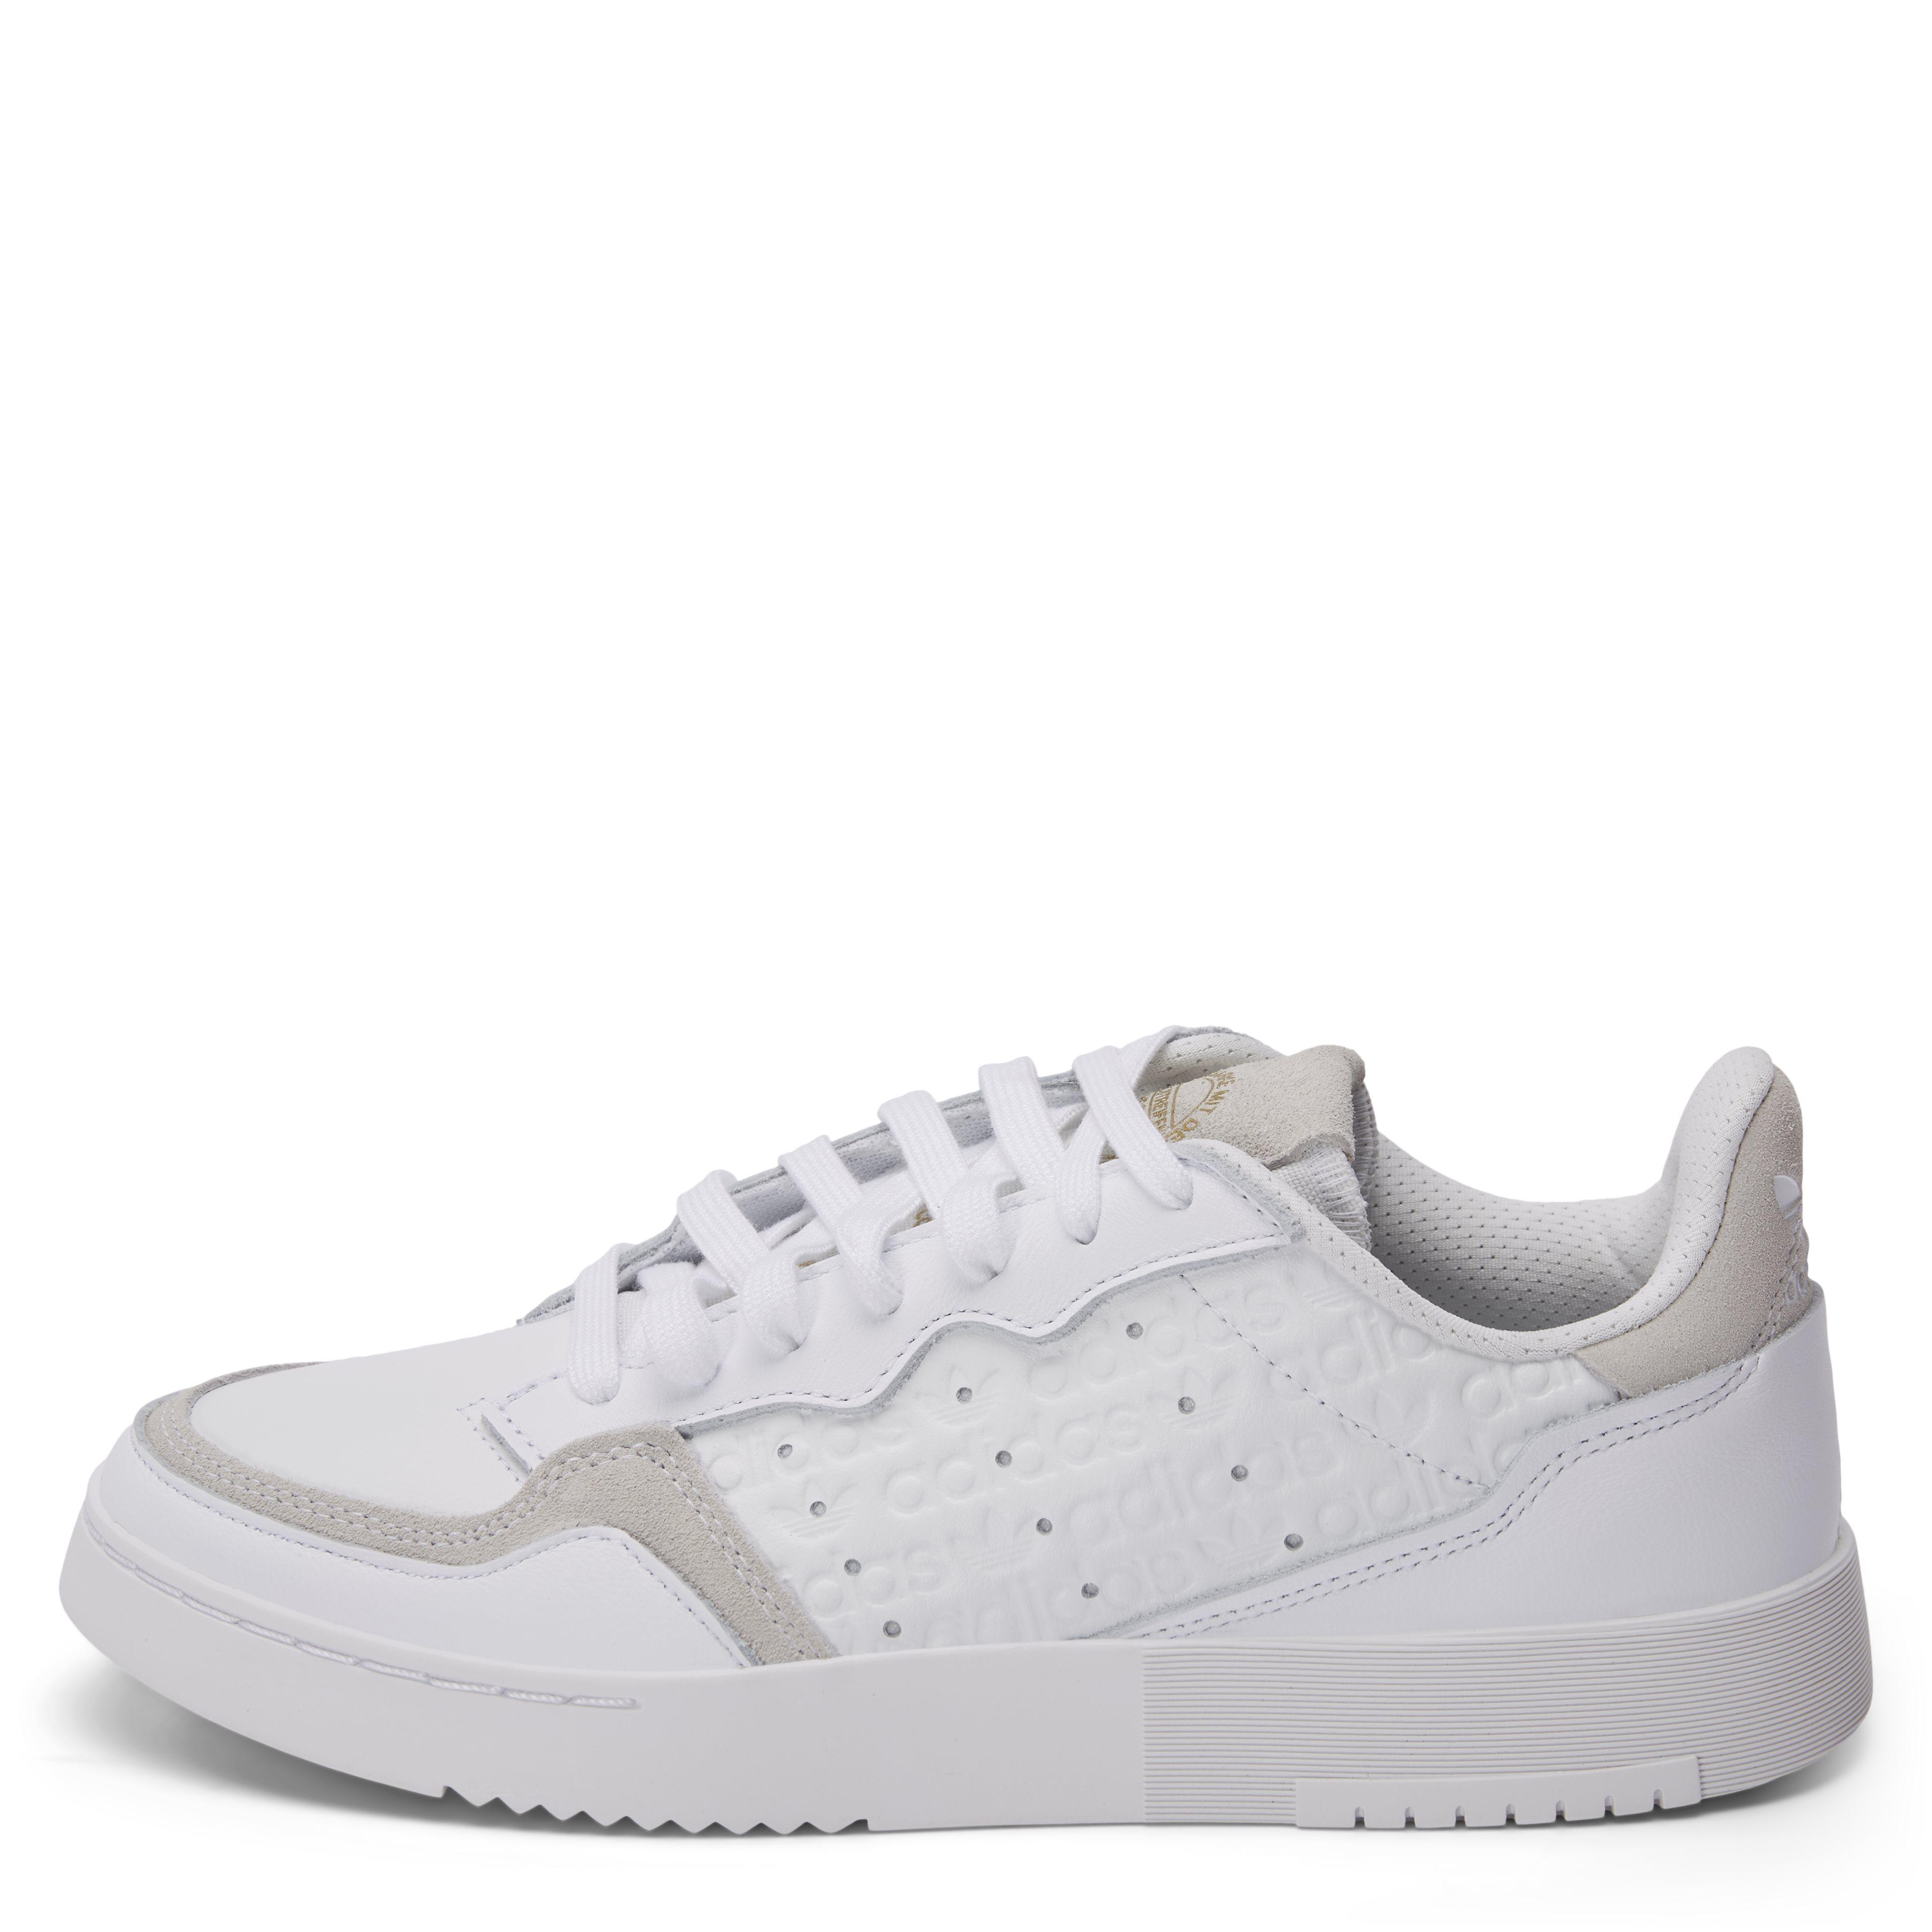 Supercourt Sneaker - Sko - Hvid